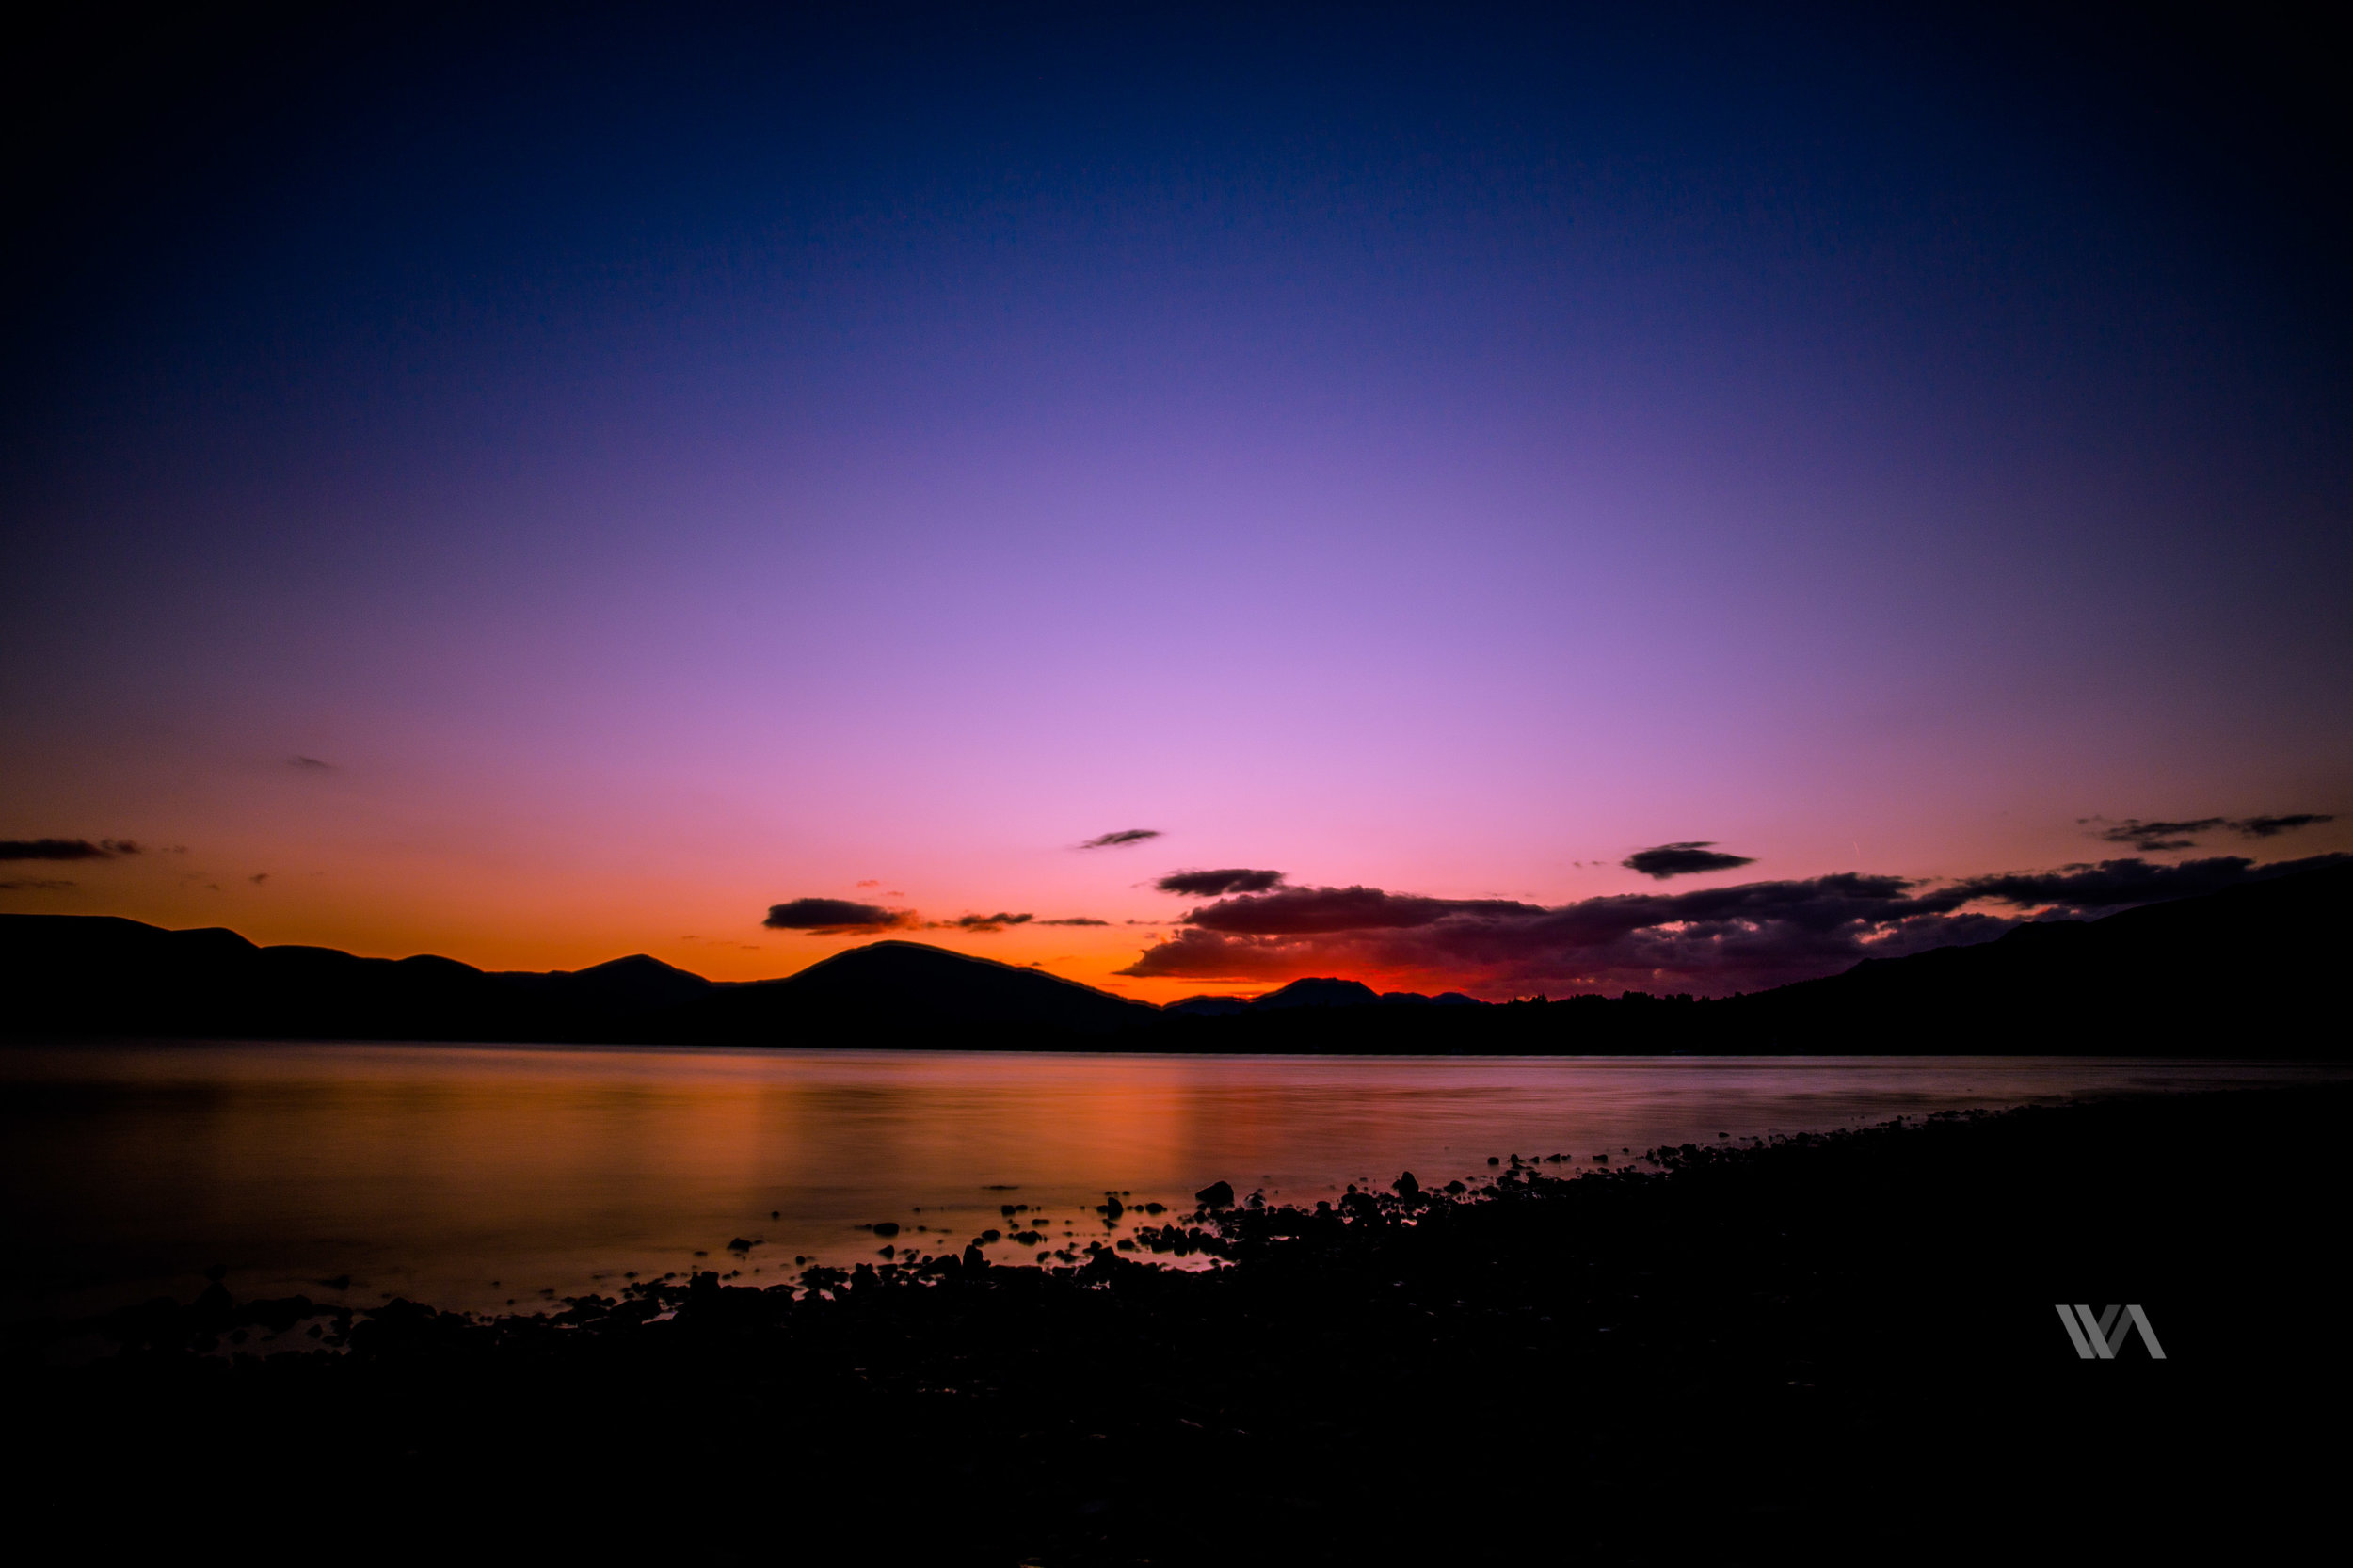 Getting dark at Loch Lomond